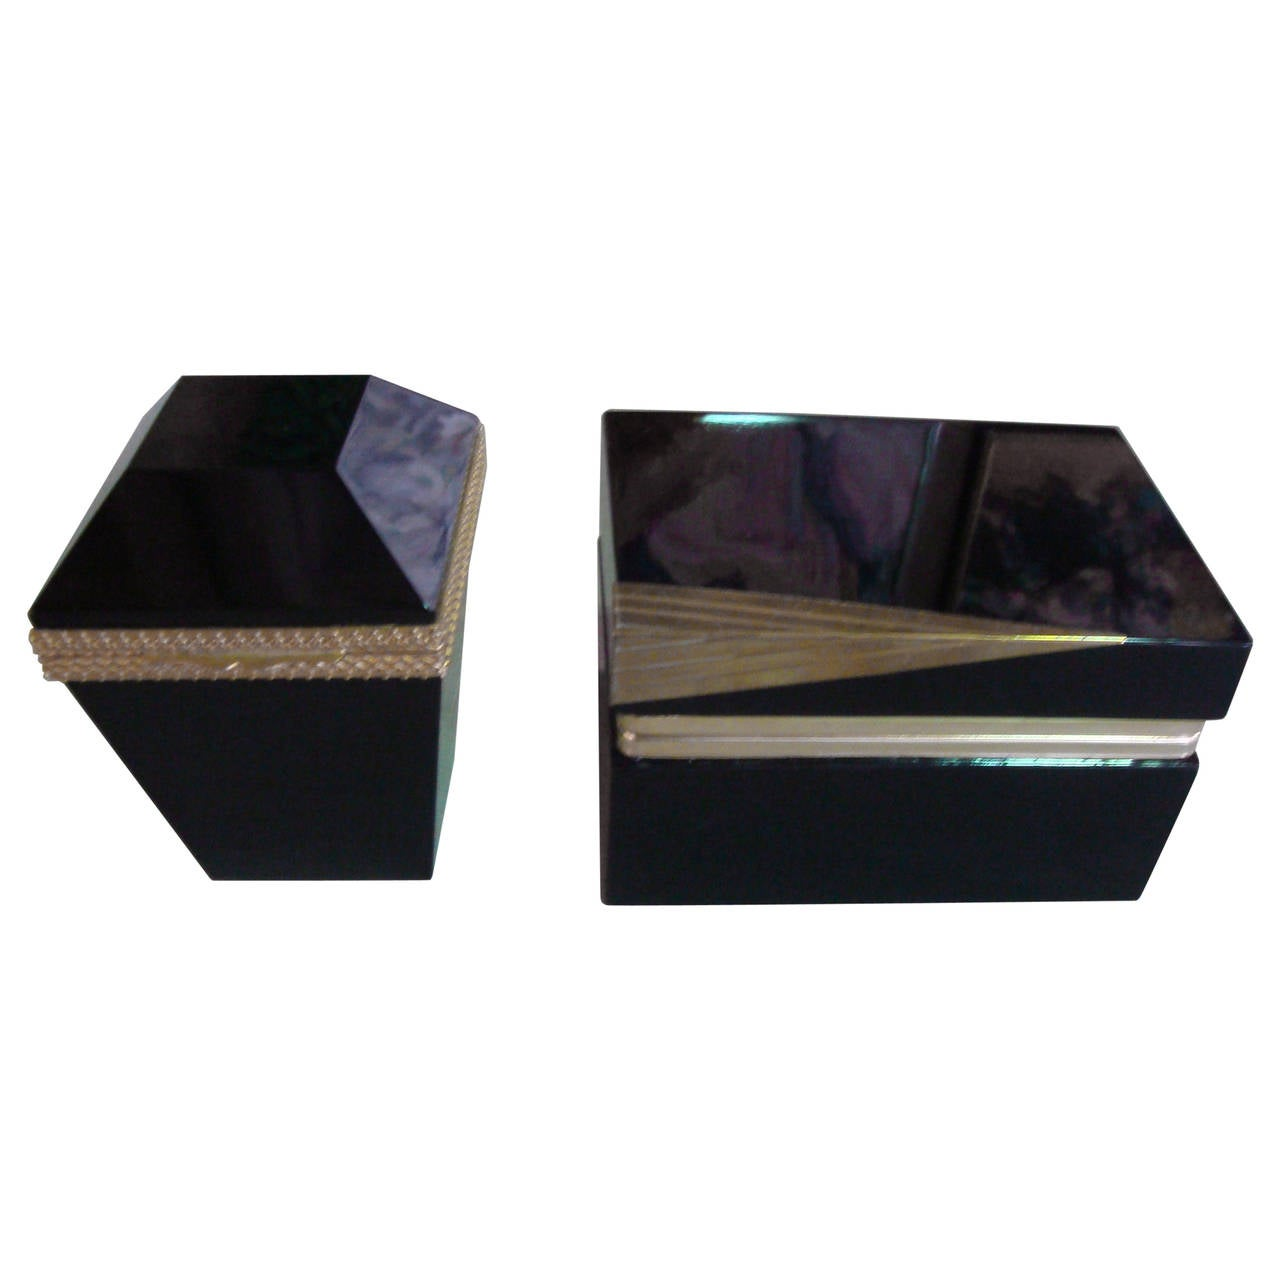 Pair of Black Opaline Boxes